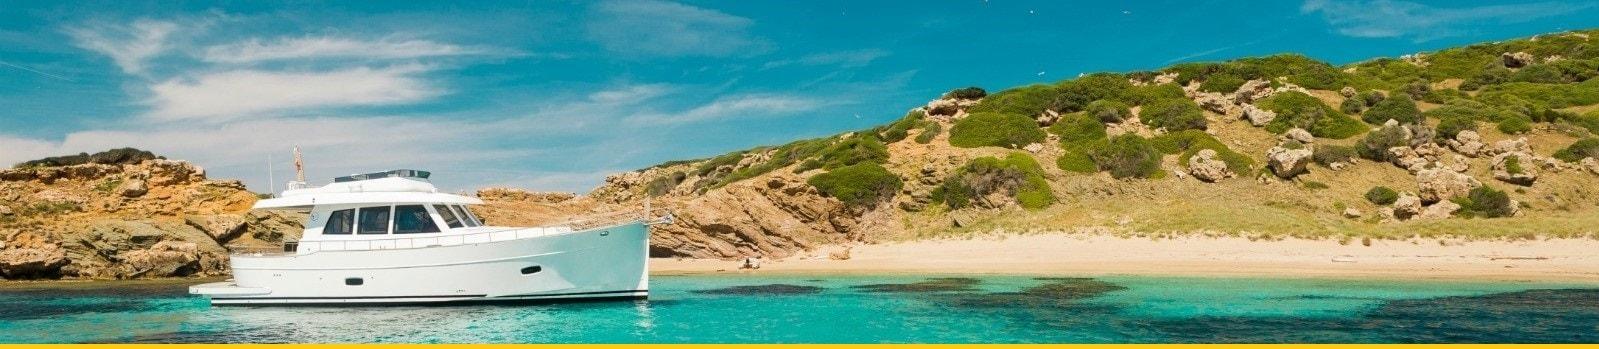 Minorca Yachts Islander 54